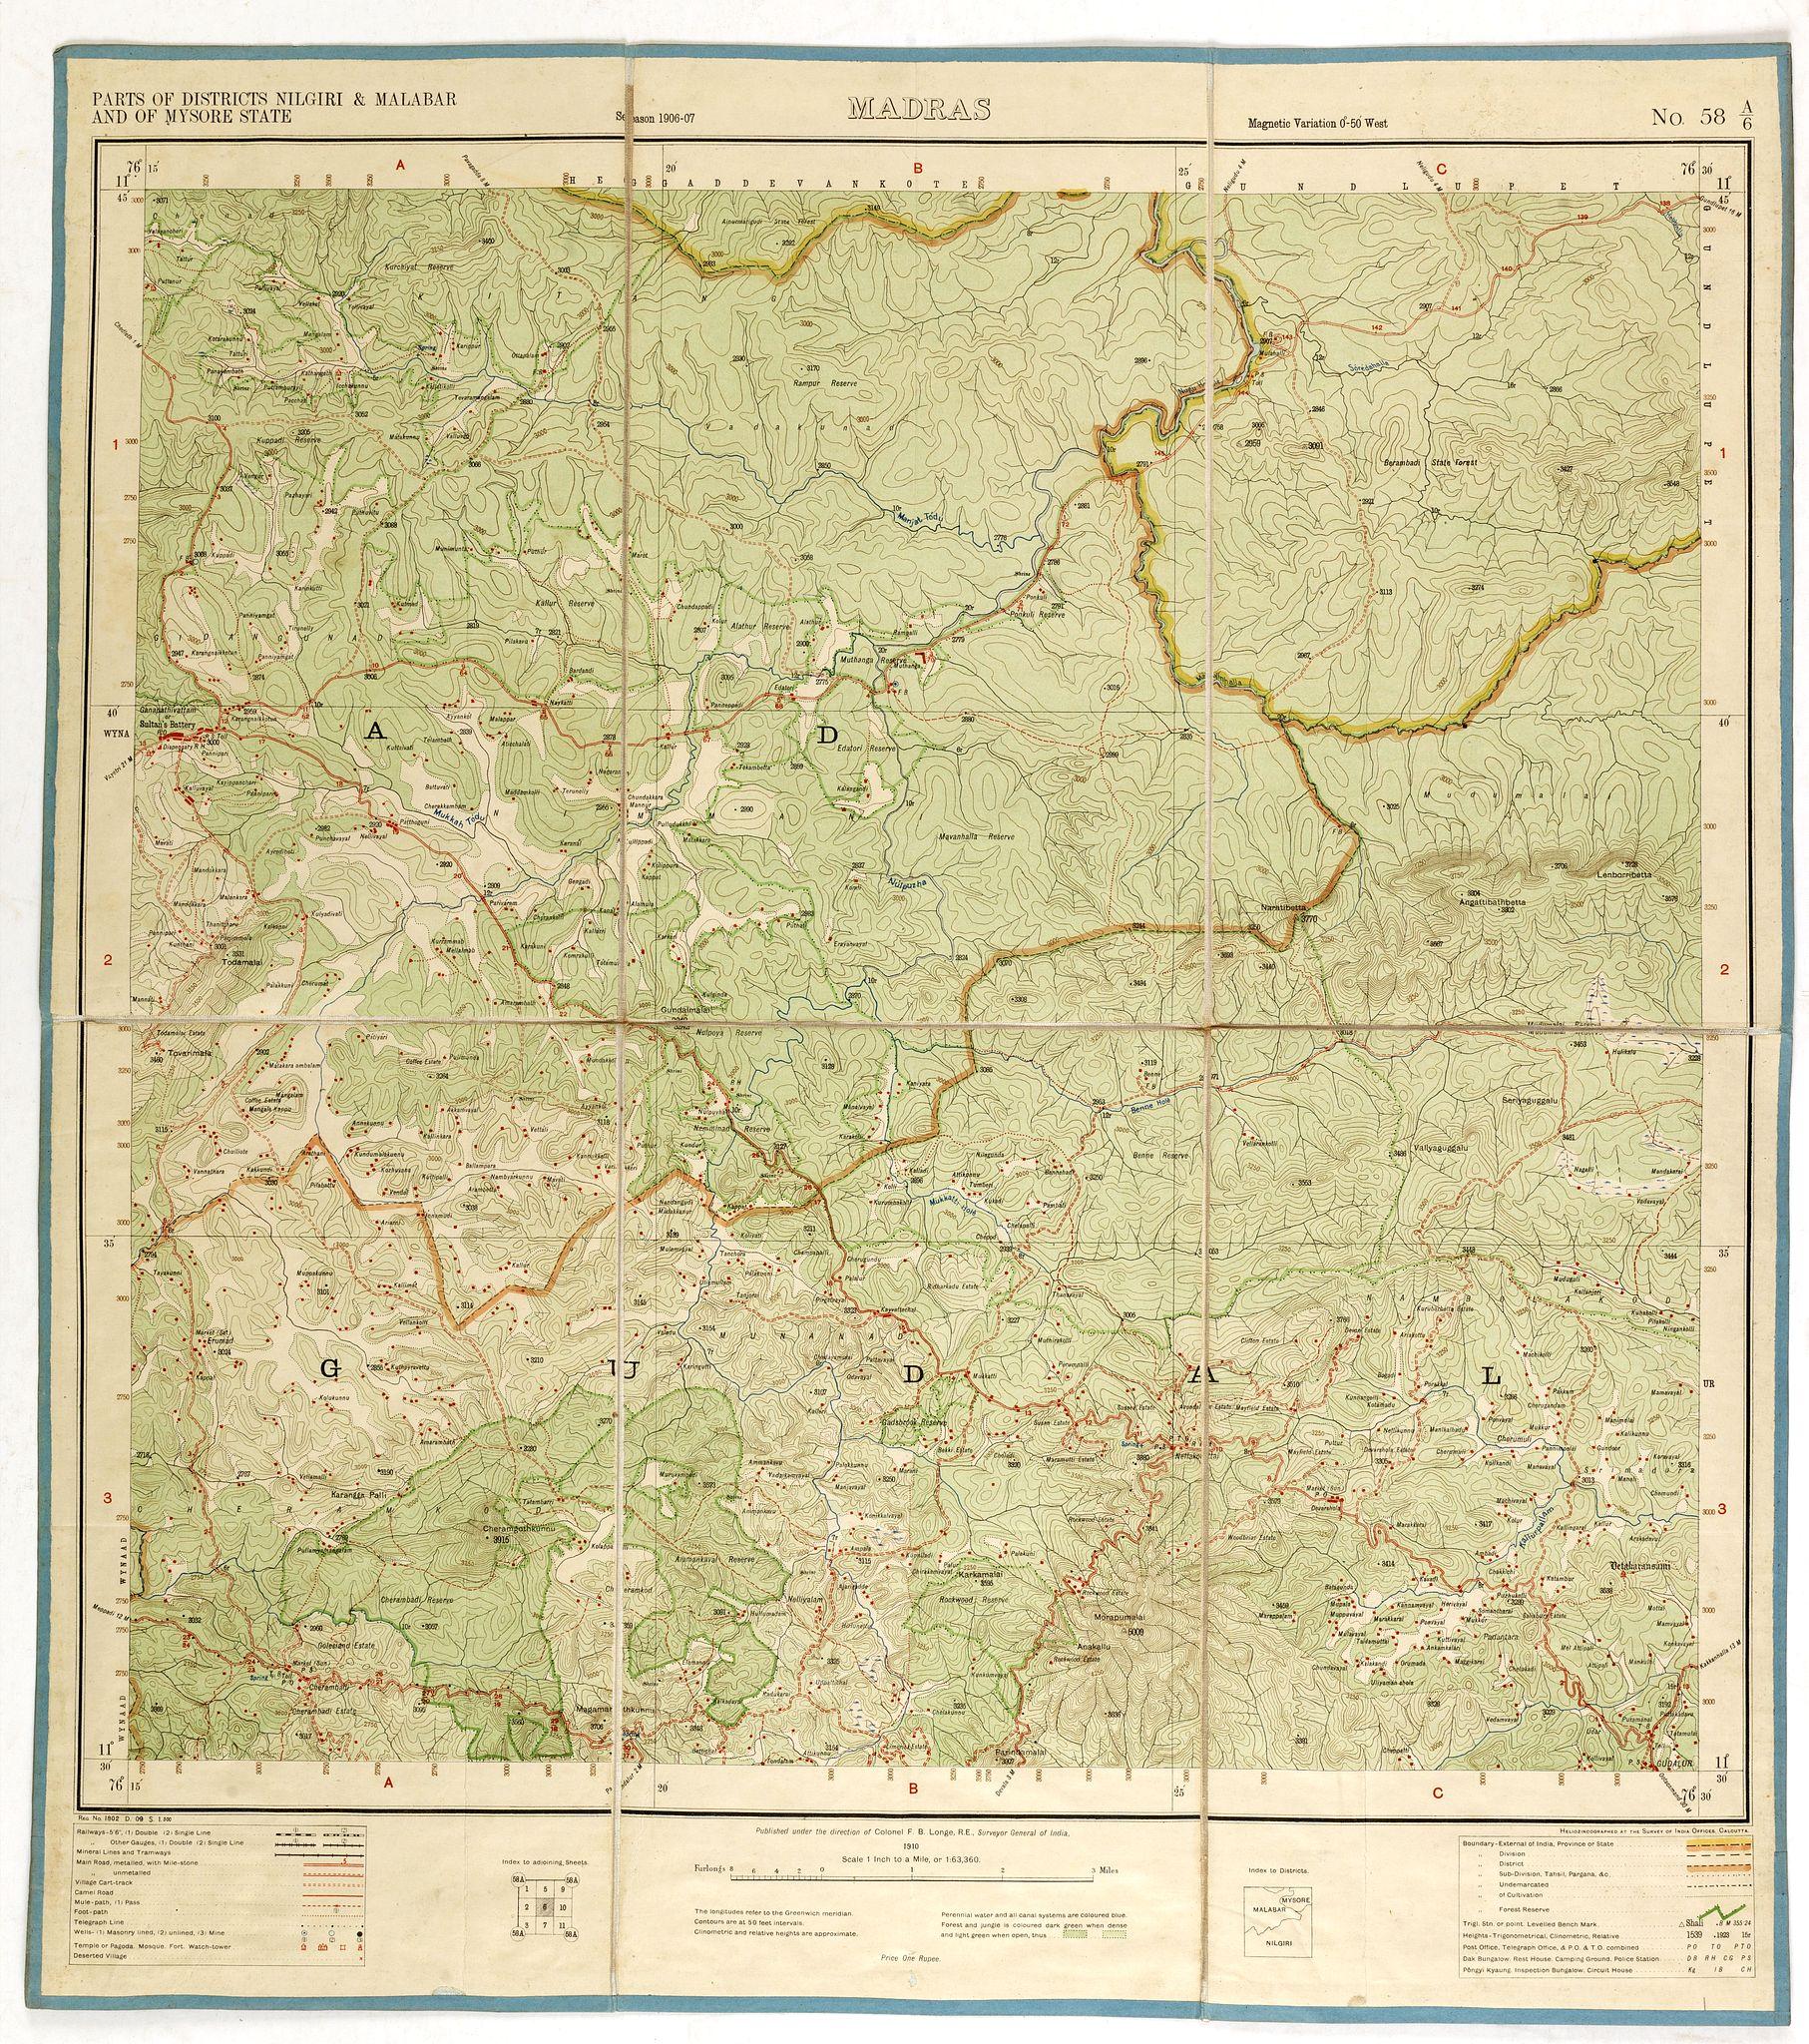 SURVEY OF INDIA LONGE - Part of district Nilgiris and Malabar and of on delhi map, mangalore map, karnataka map, biratnagar map, munnar map, dhar city map, anjuna beach map, bombay map, madras map, agumbe map, bengal map, hyderabad map, satpura map, bangalore map, kerala map, kashmir map, india map, tamil nadu map, chennai international airport map, calcutta world map,